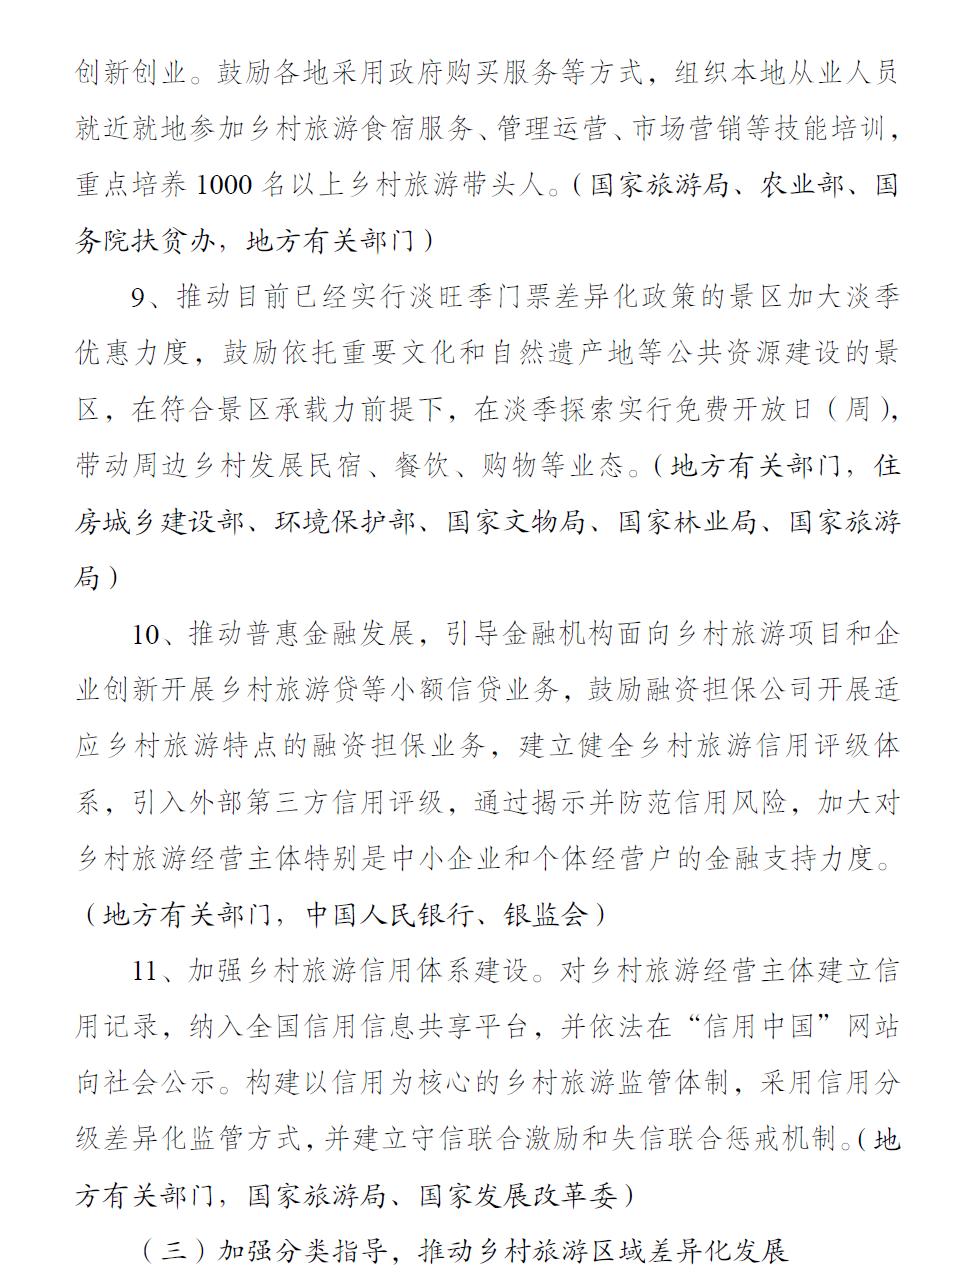 xiangcun191203j